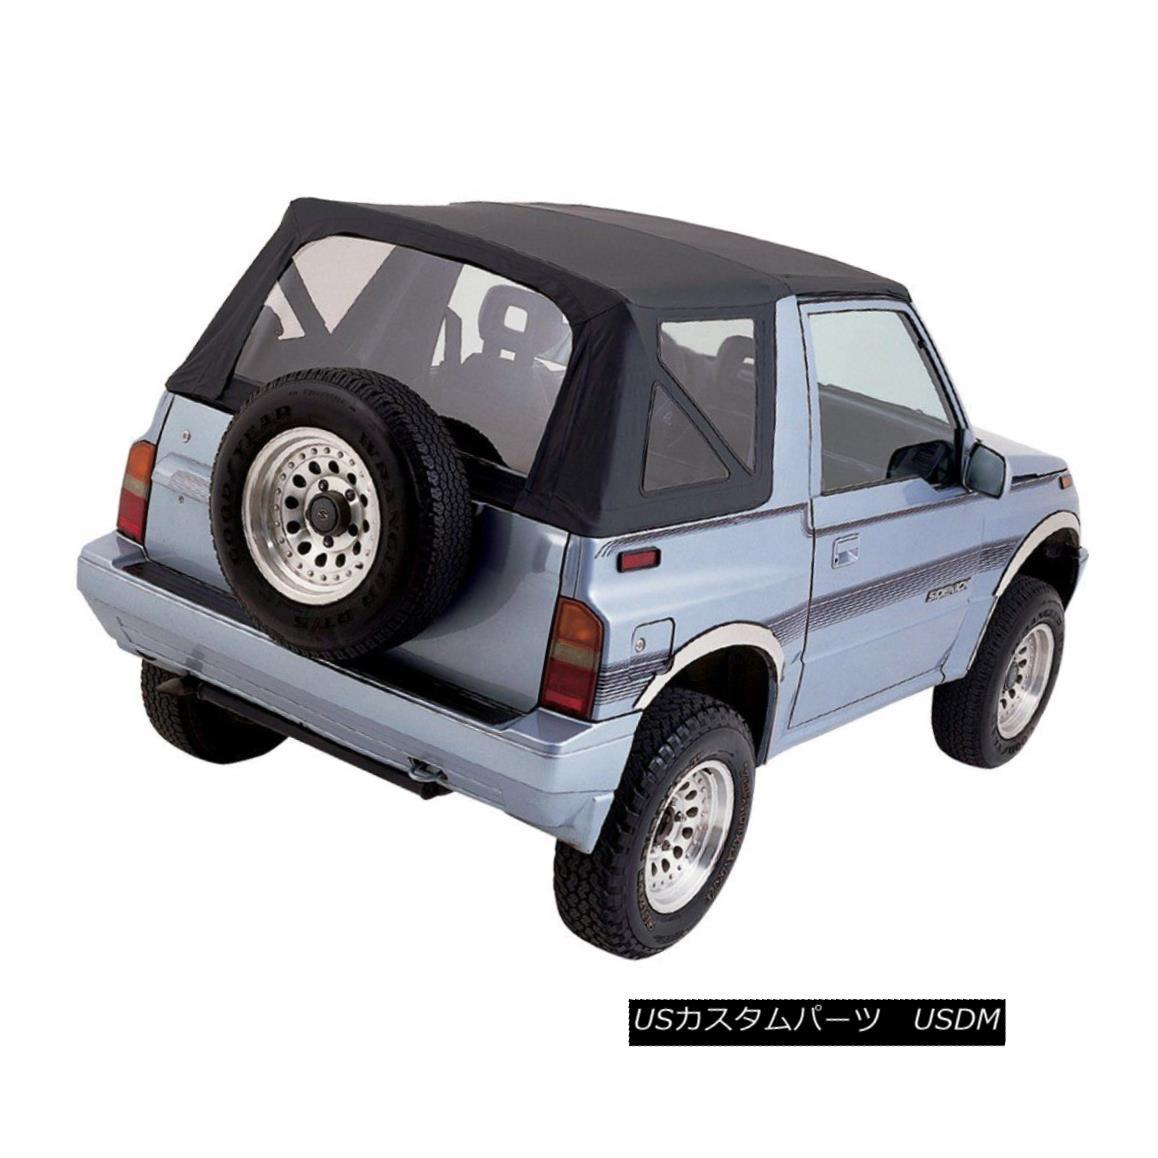 EBC Brake Discs 2-Wheel Set Front Driver /& Passenger Side New FWD RK850